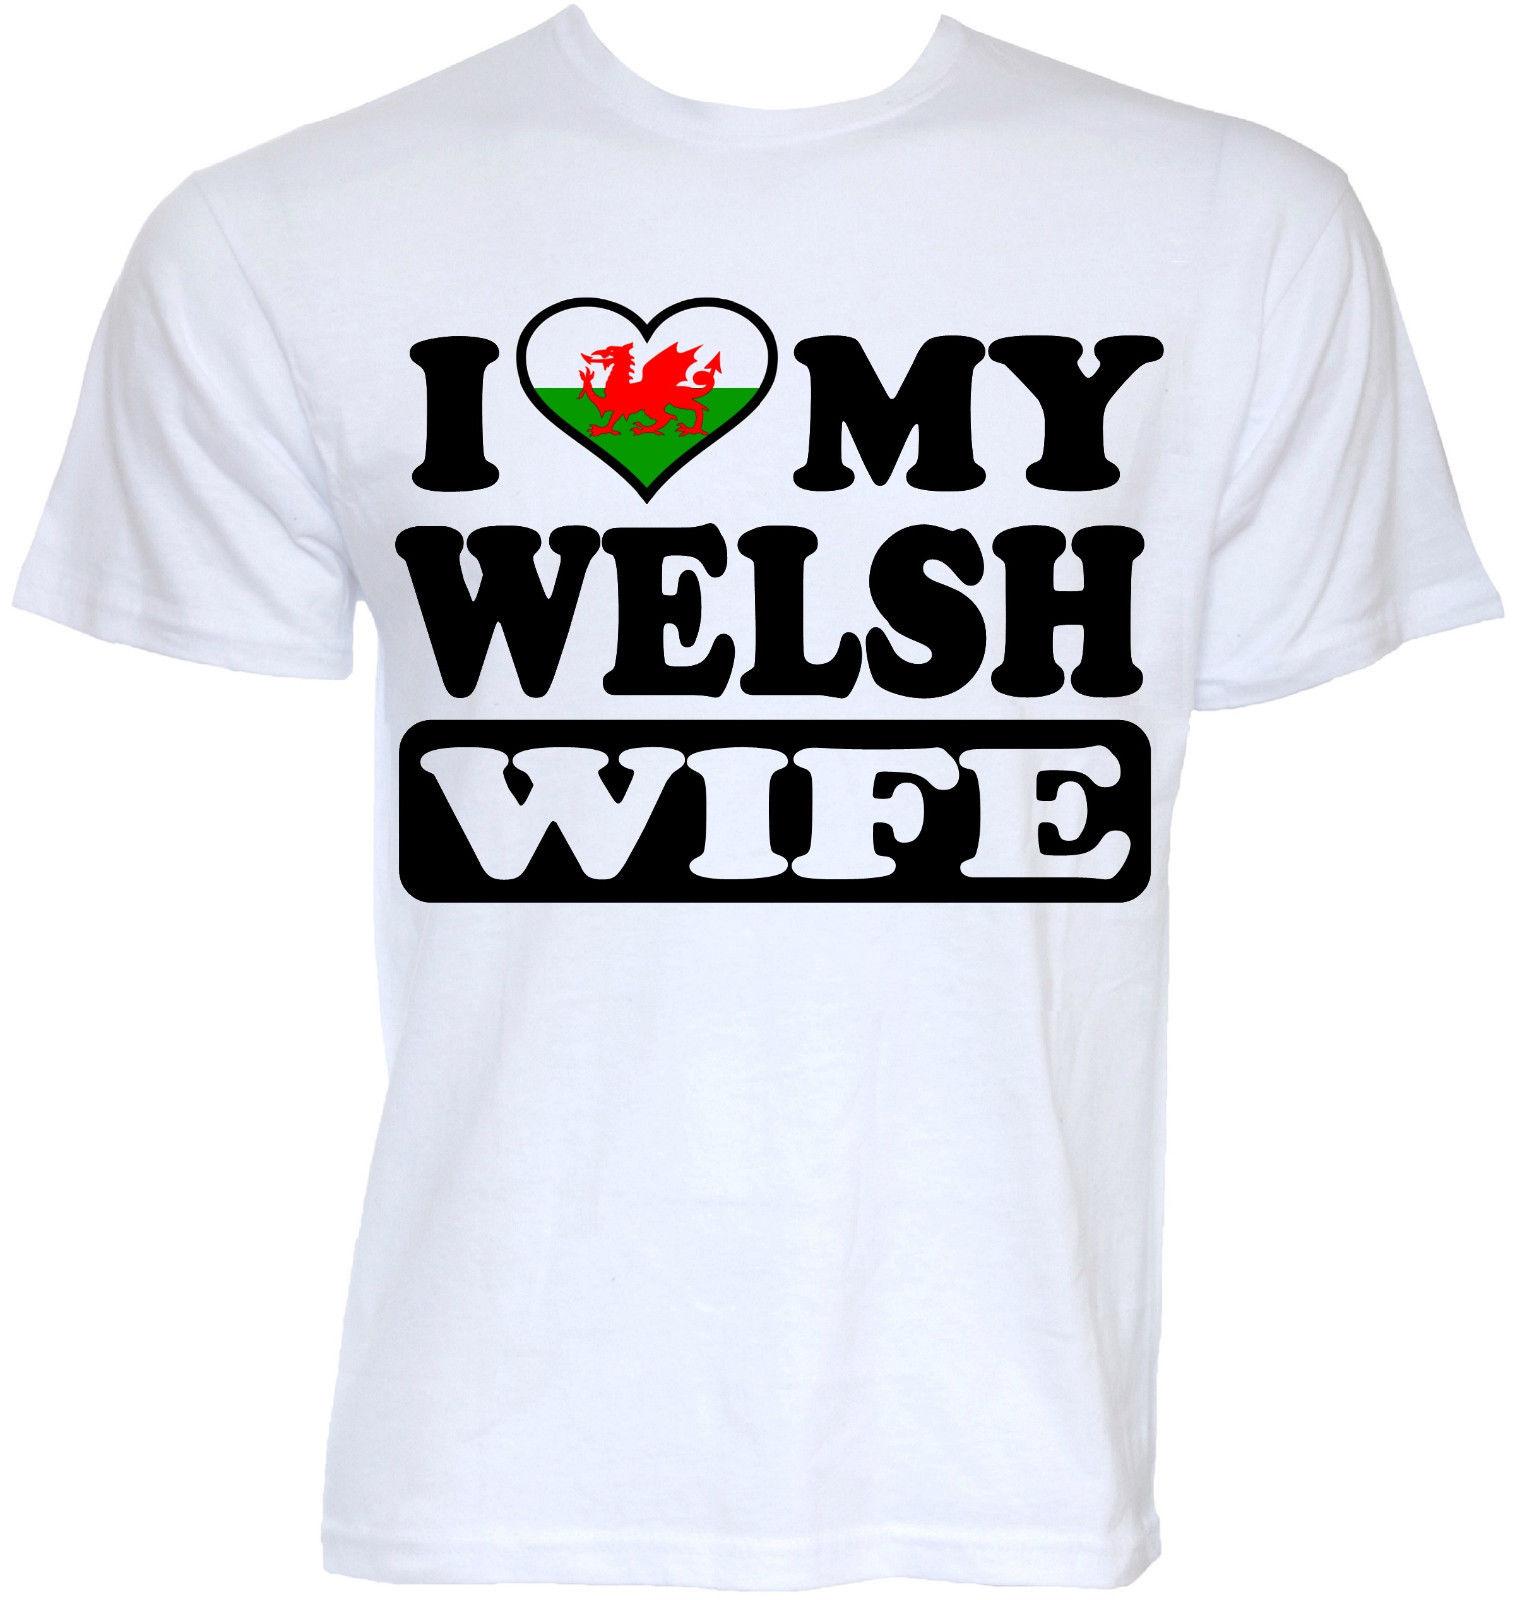 Design t shirt uk - Mens Funny Cool Novelty Welsh Wife Wales Flag Joke Uk Rude Slogan T Shirts Gifts Men T Shirt Great Quality Funny Man Cotton